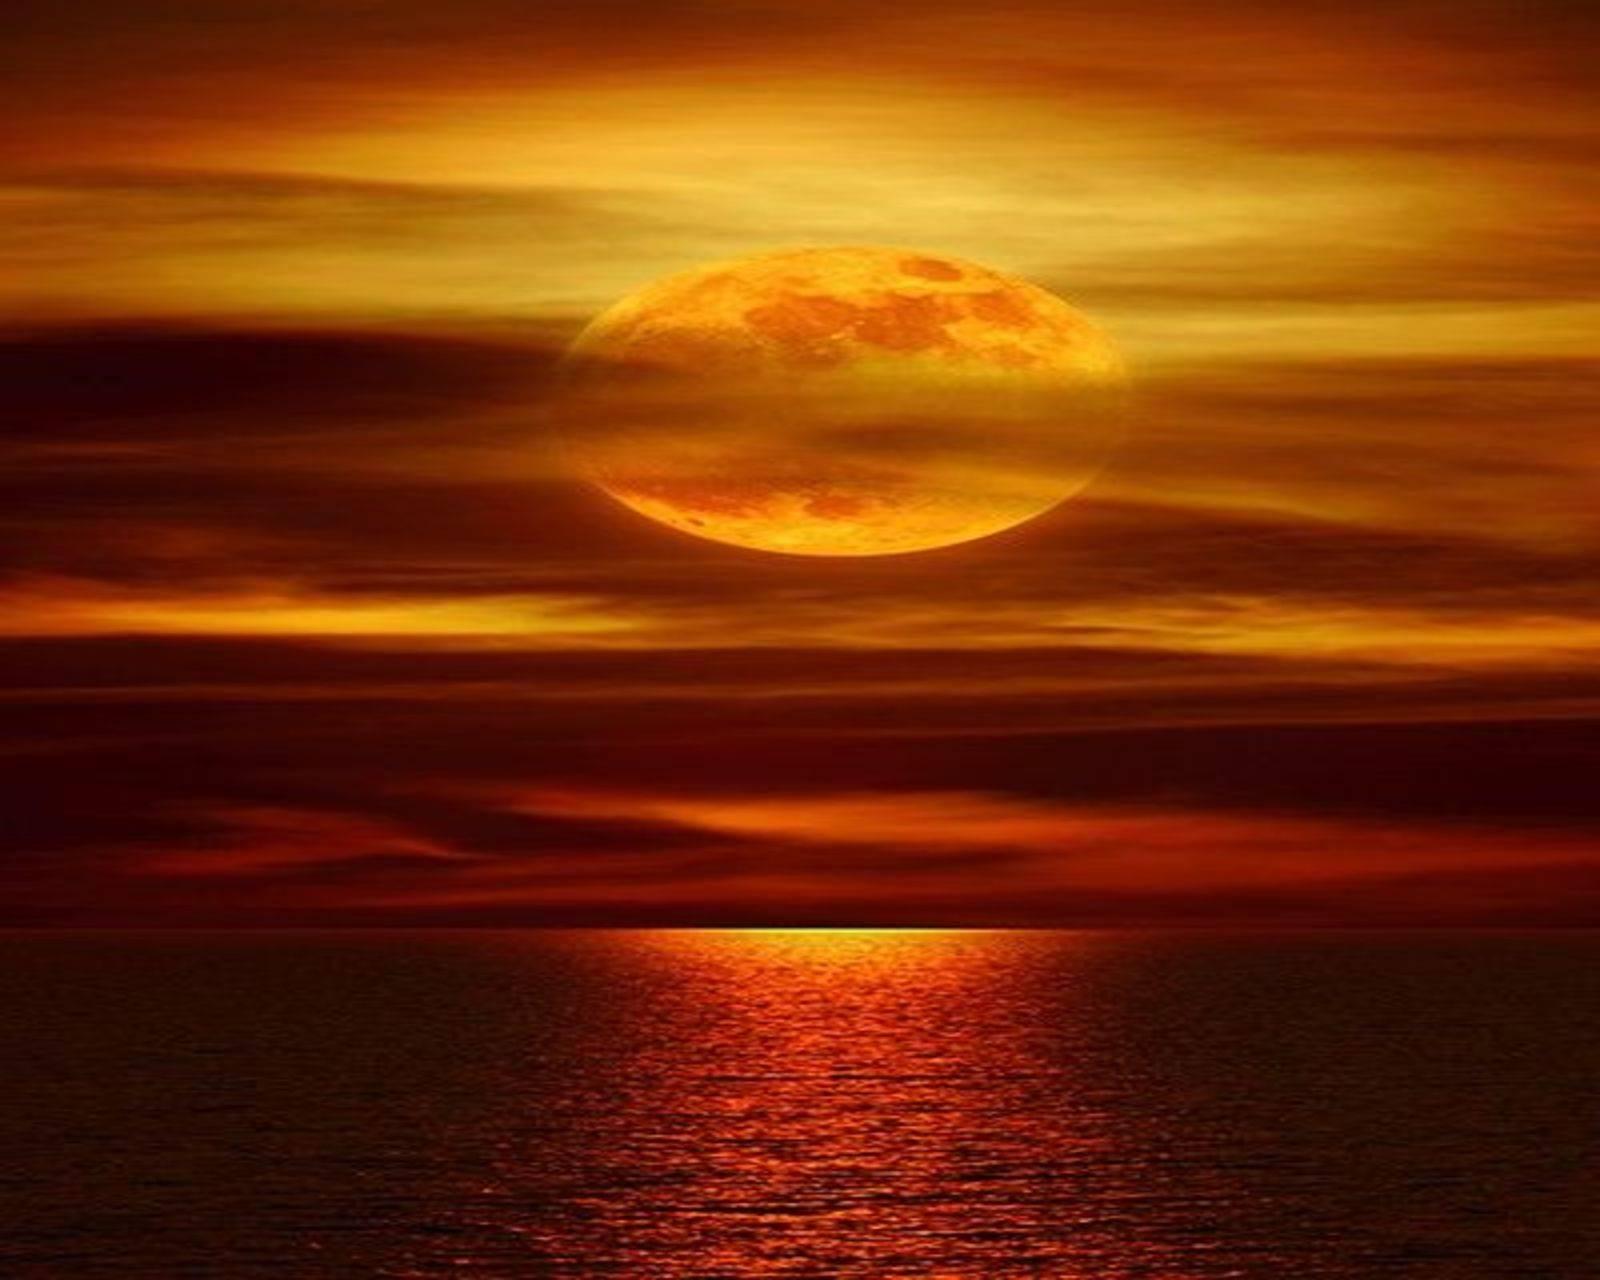 Orage Moonlight